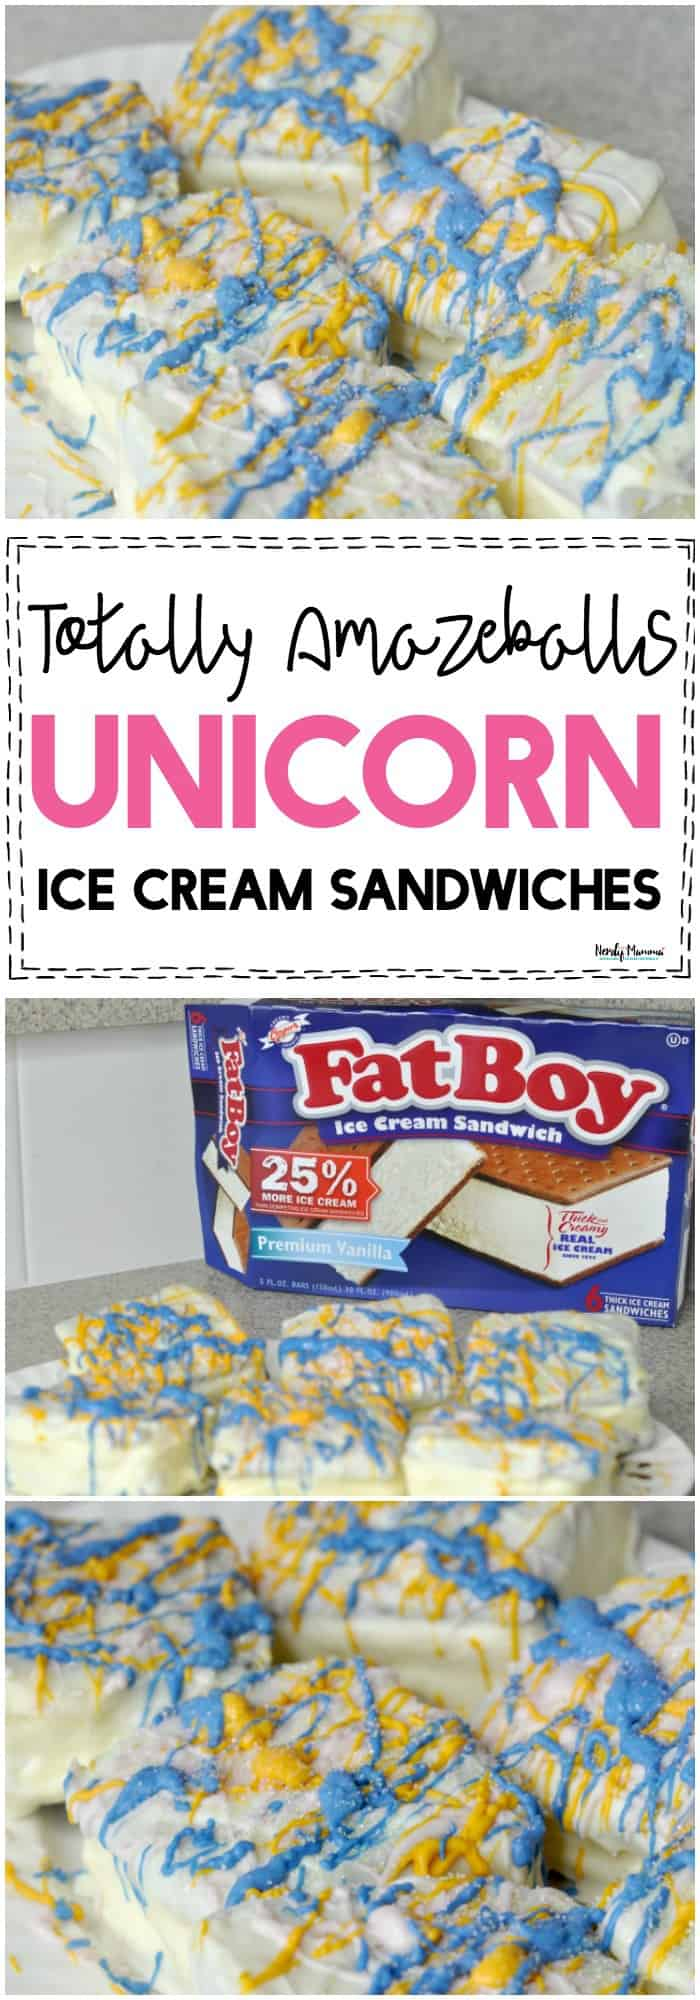 OMG You've GOT to try these AMAZEBALLS Unicorn Ice Cream Sandwiches! SO YUMMY!